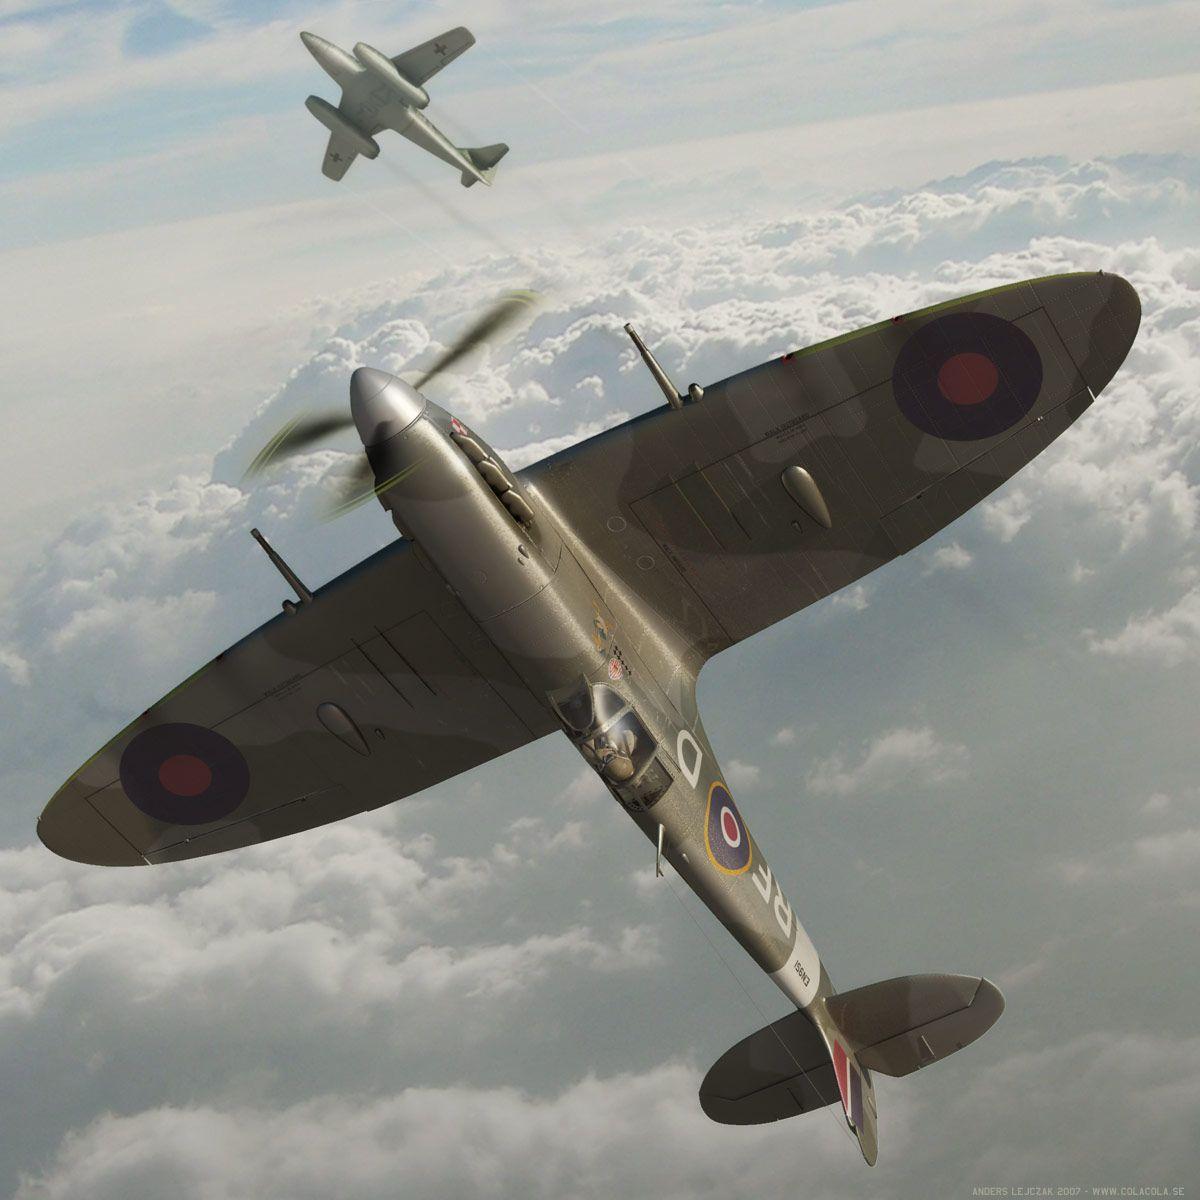 Fictitious Encounter Of Spitfire Mkv Vs A Messerschmitt Me262 Beautiful 3d Rendering By Anders Lejczak Using Aircraft Art Fighter Jets Military Aircraft